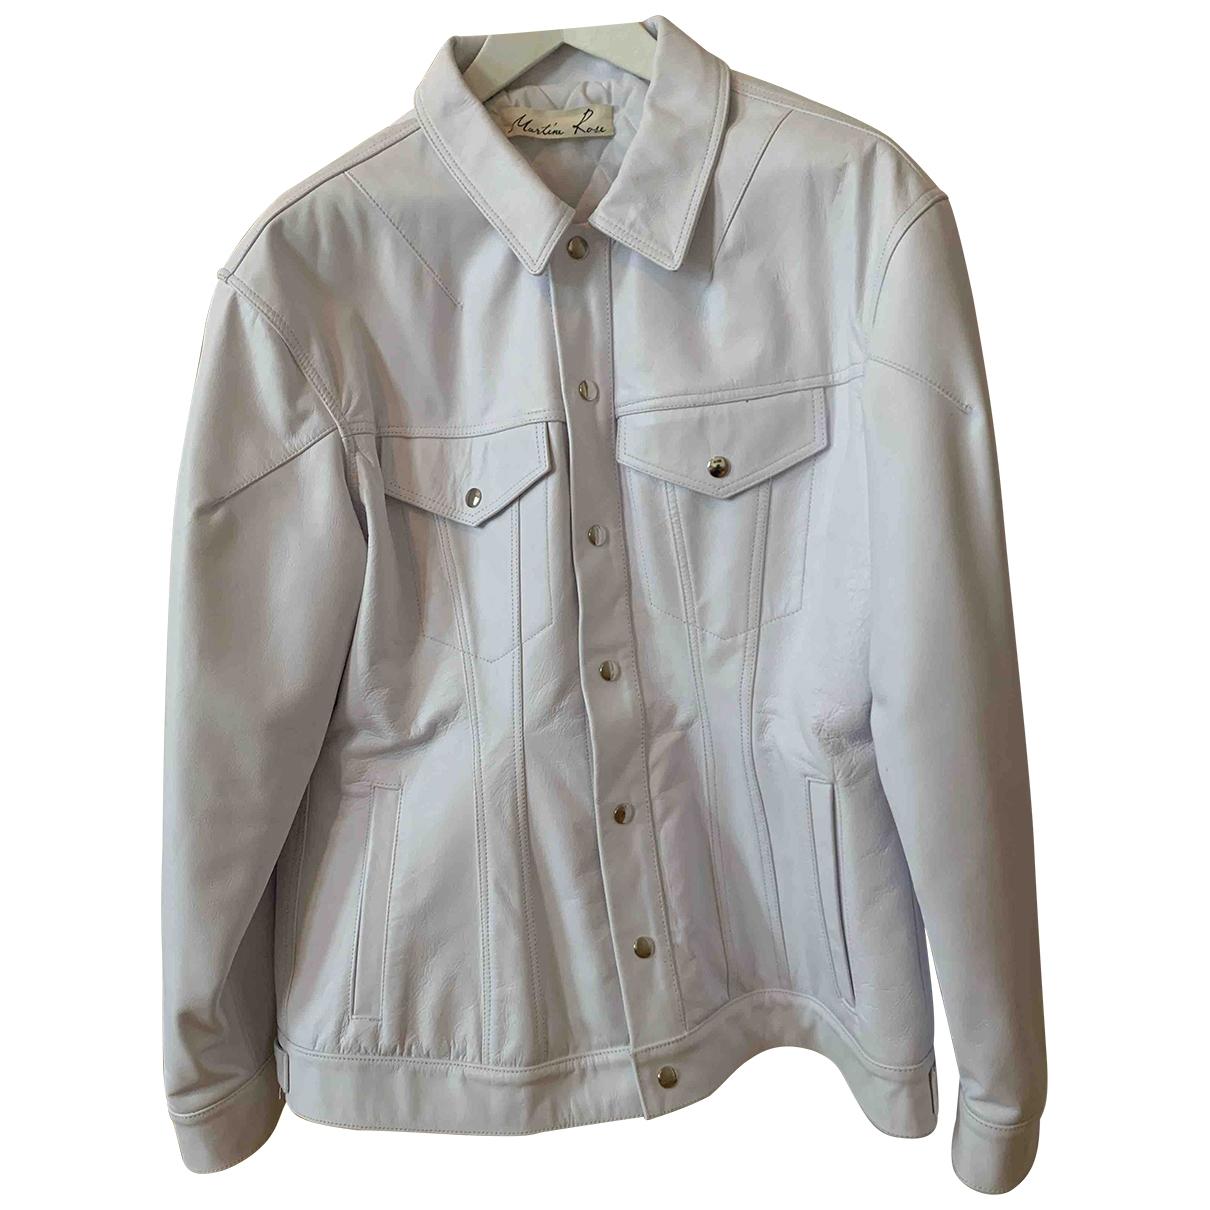 Martine Rose \N White Leather jacket for Women M International